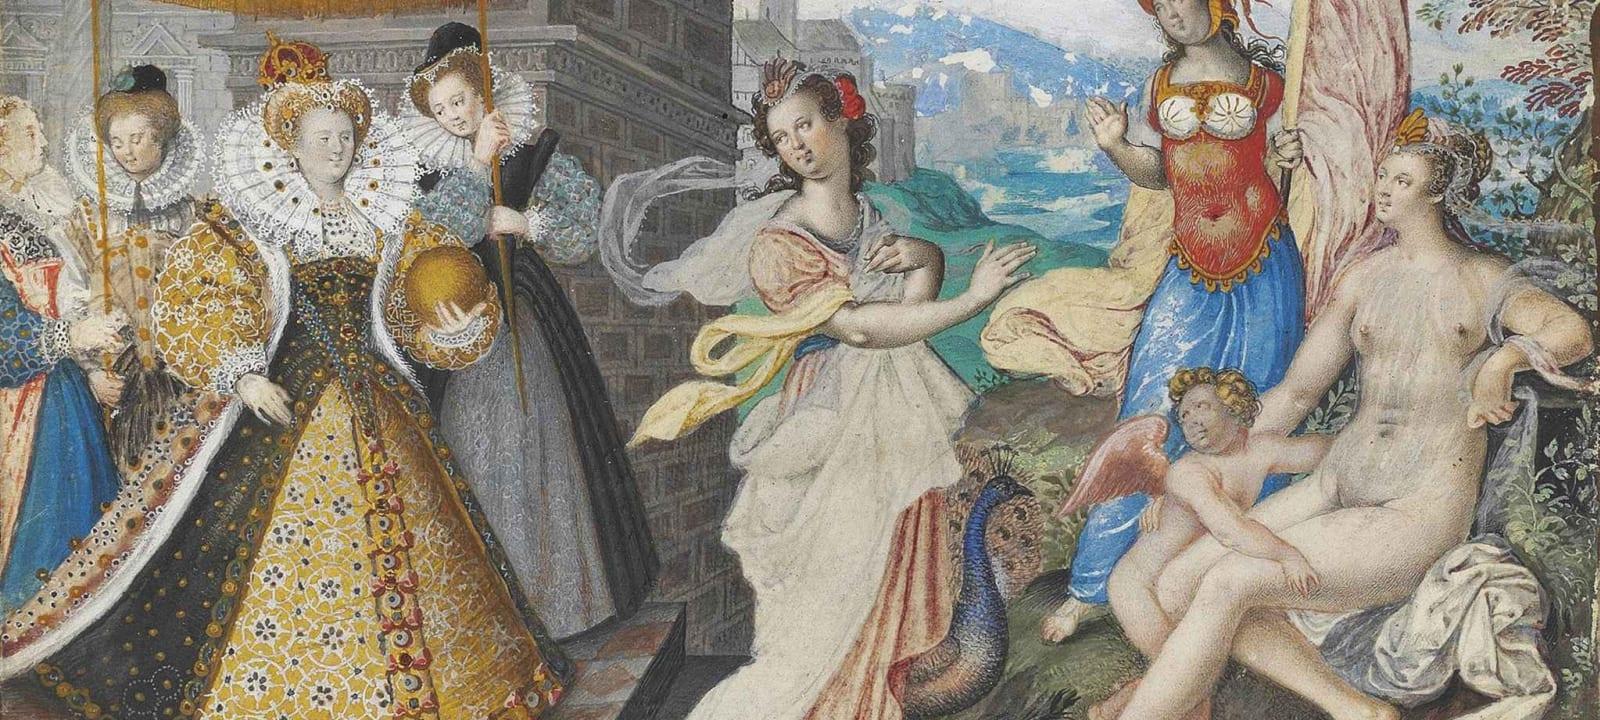 The cult of Elizabeth I